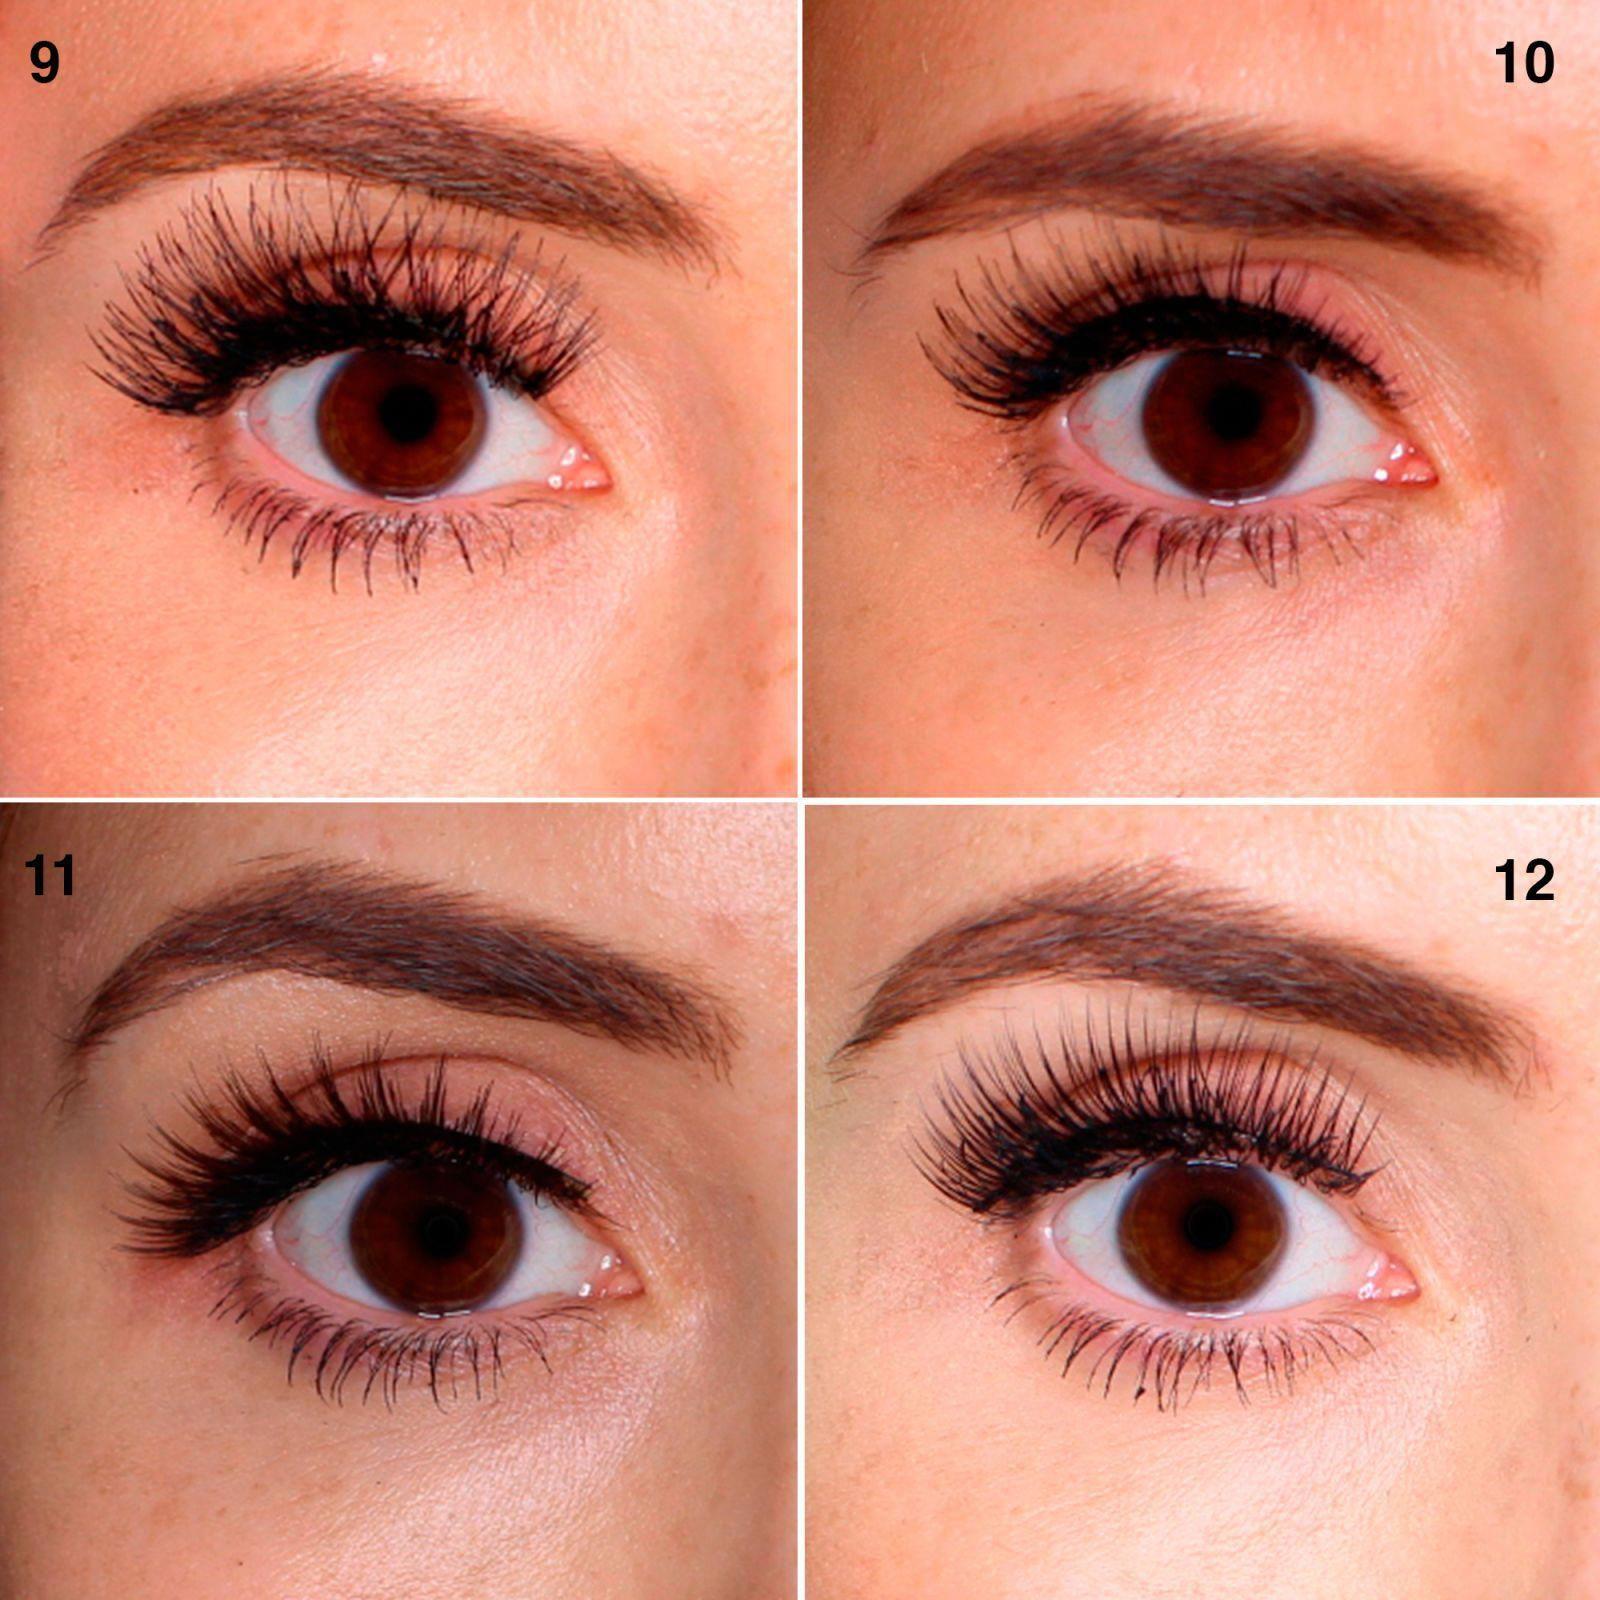 The Best Eyelashes Affordable Eyelash Extensions Lash Extension